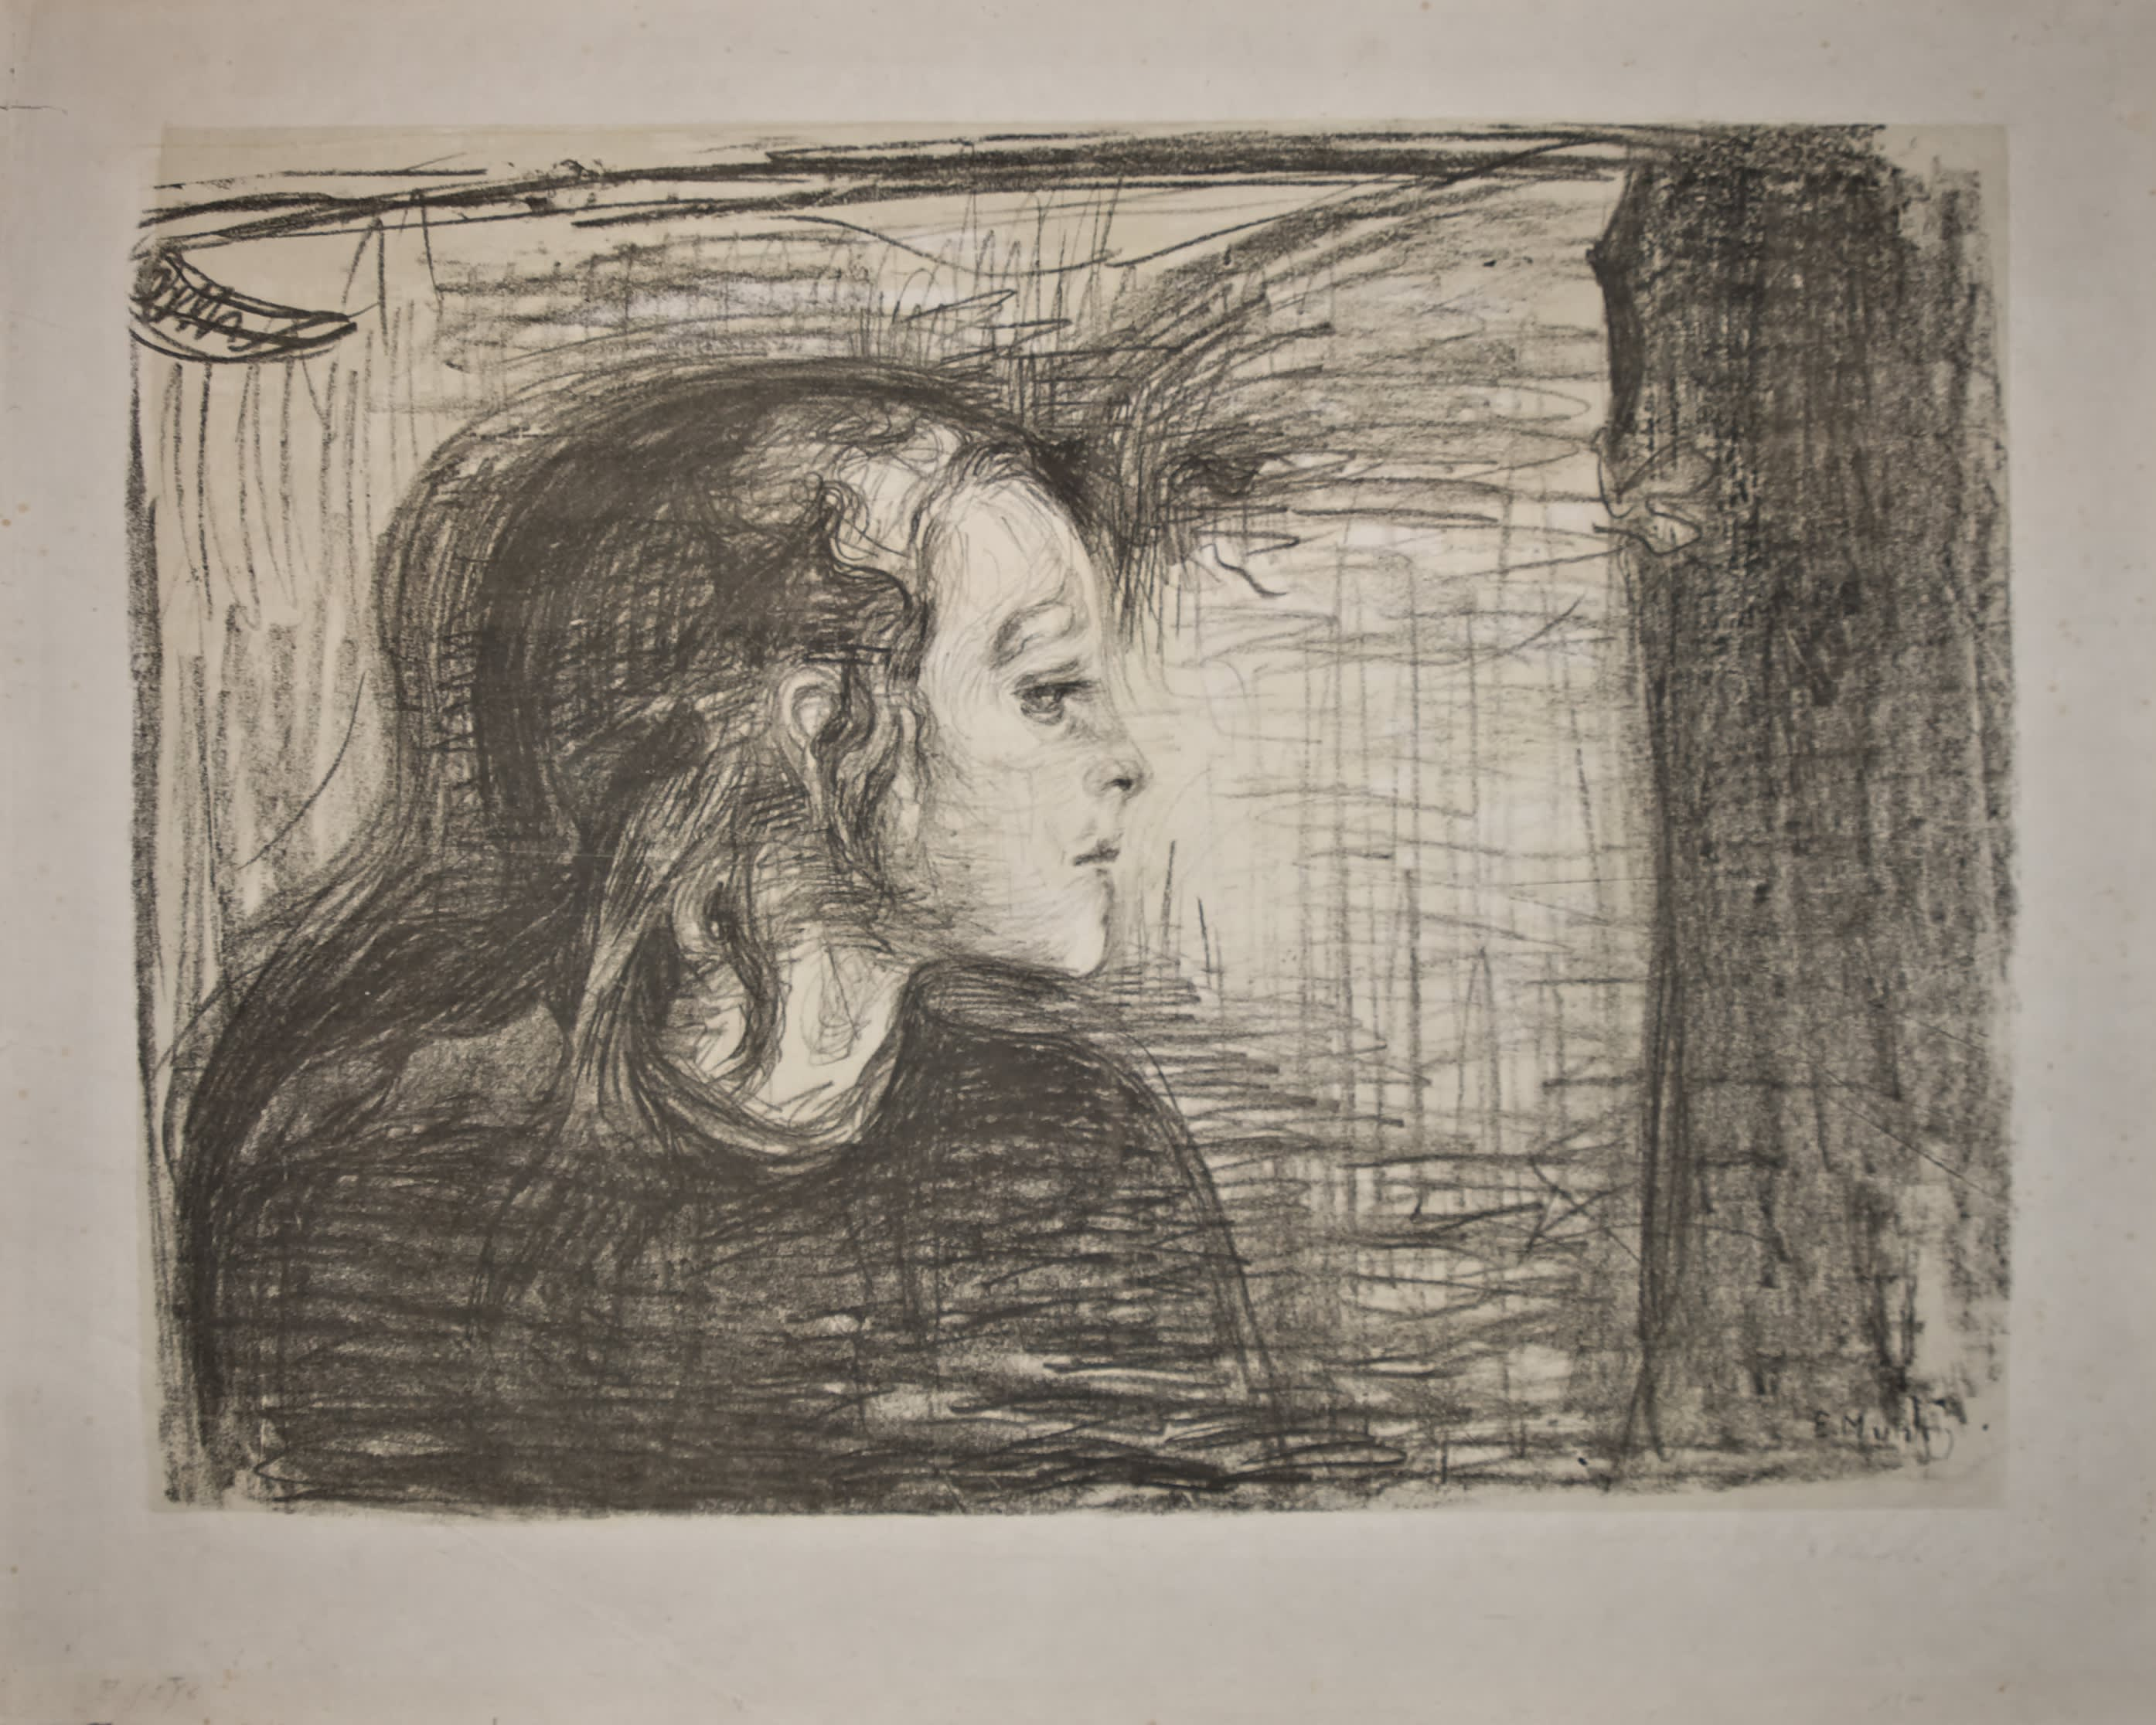 Munch's sister portrait